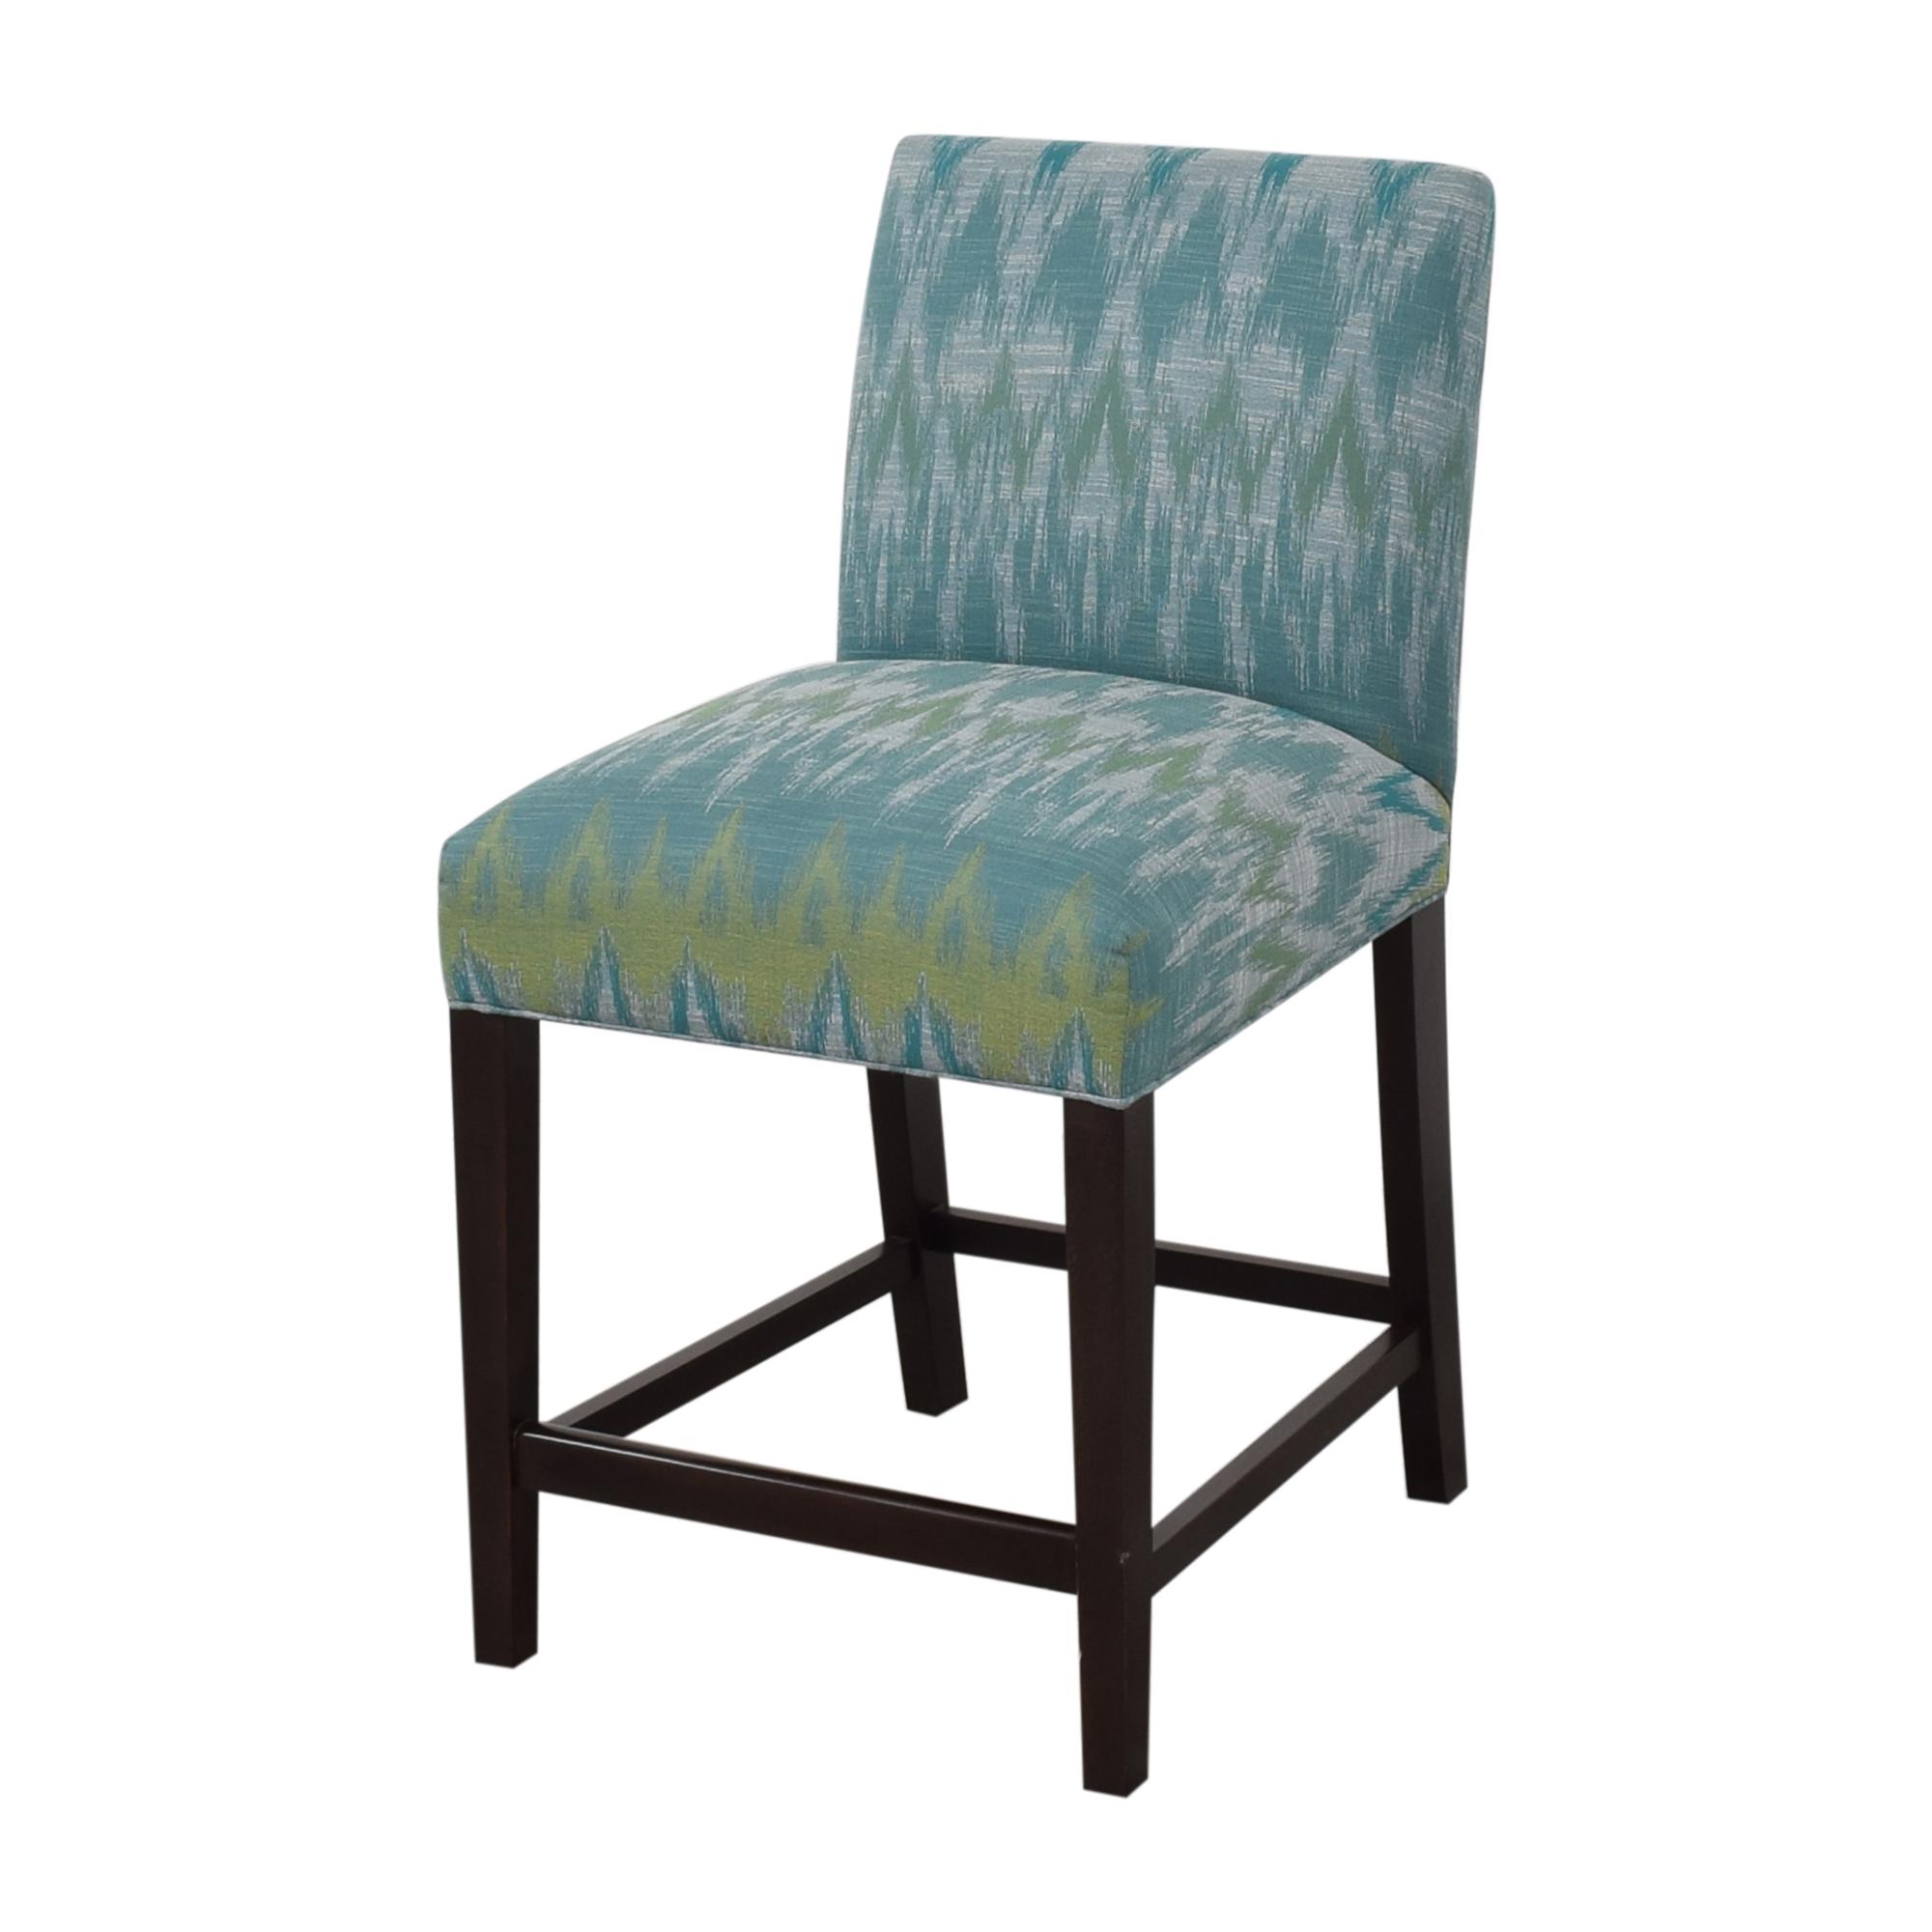 shop Ethan Allen Thomas Counter Stool Ethan Allen Chairs